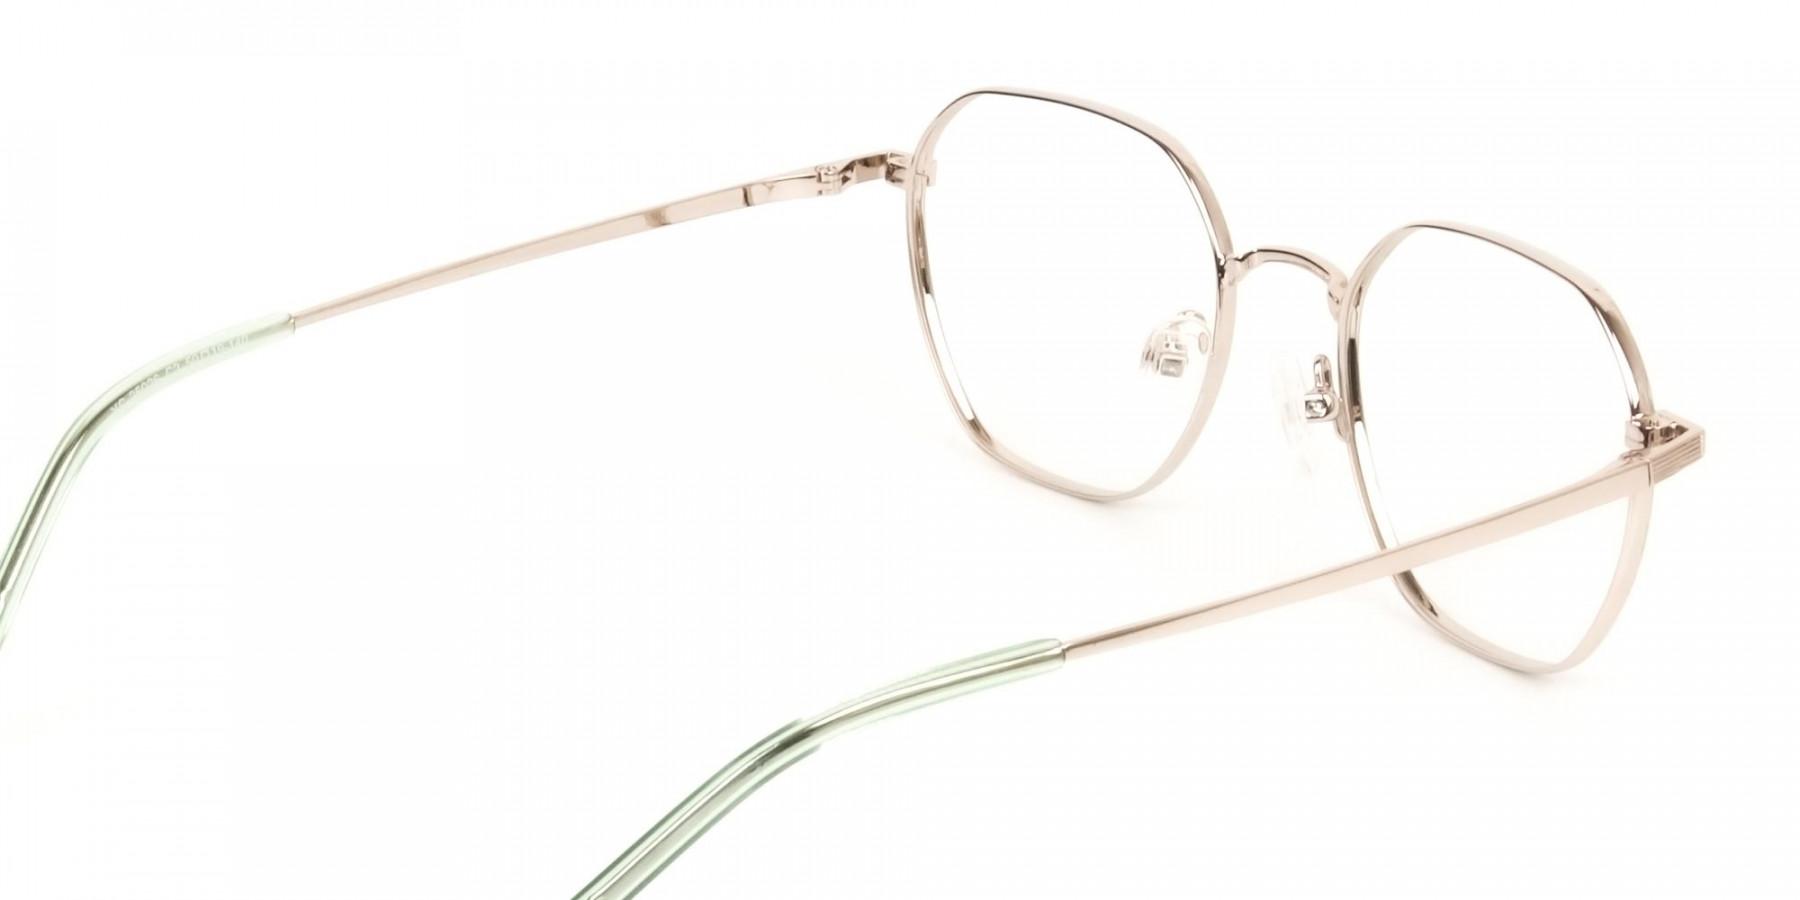 Gold Mint Green Geometric Glasses in Hexagon Shape - 1